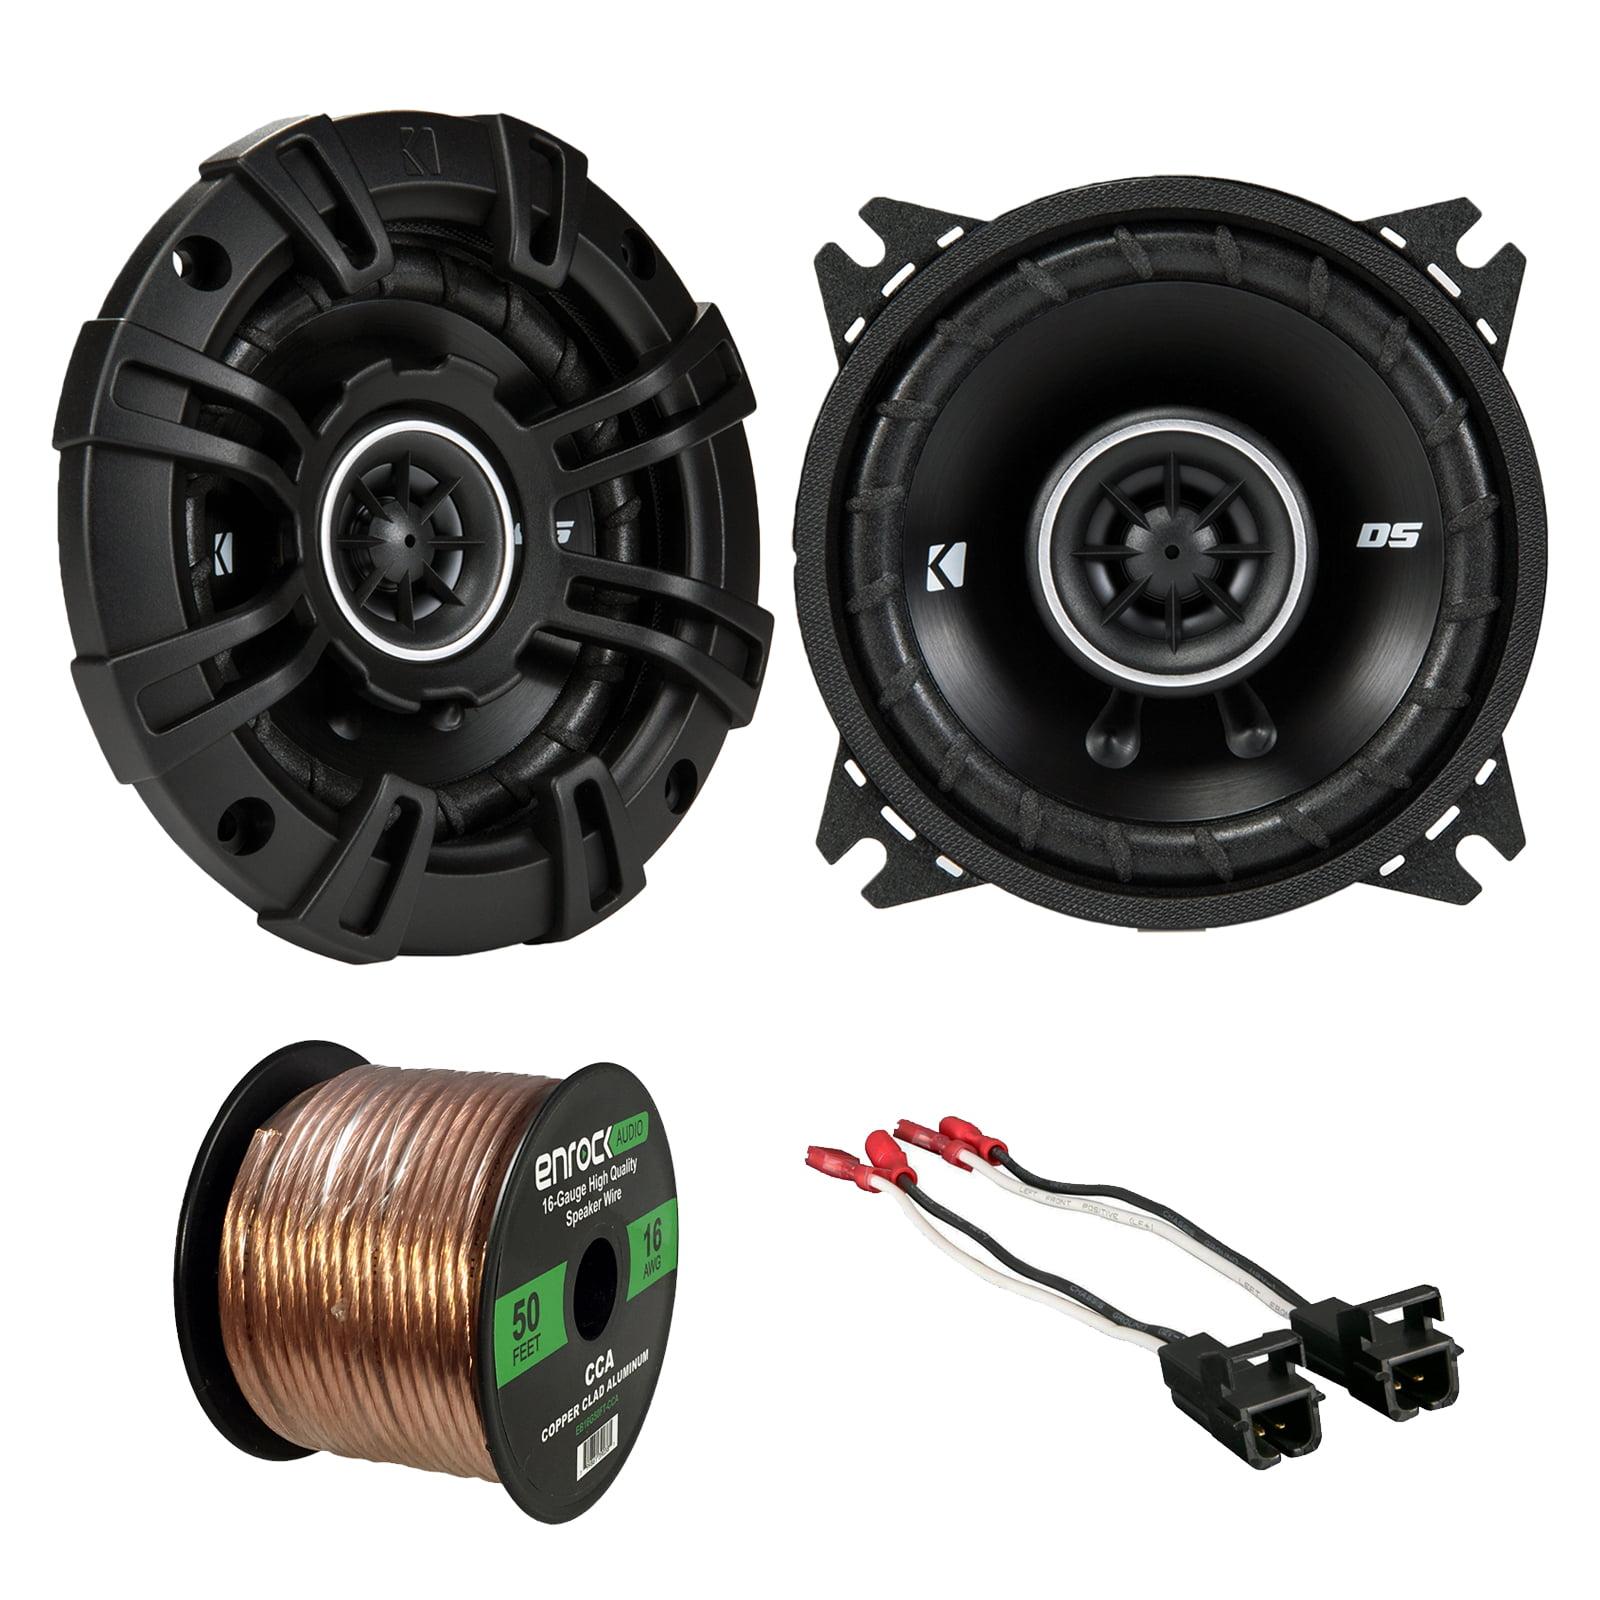 Audio Package: Kicker 43DSC44 D-Series 4-Inch 120 Watt 2-Way Coaxial Speakers (Pair), Metra 72-4568 Speaker Wire Harness for Select GM Vehicles, Enrock Audio 16-Gauge 50 Foot Speaker Wire